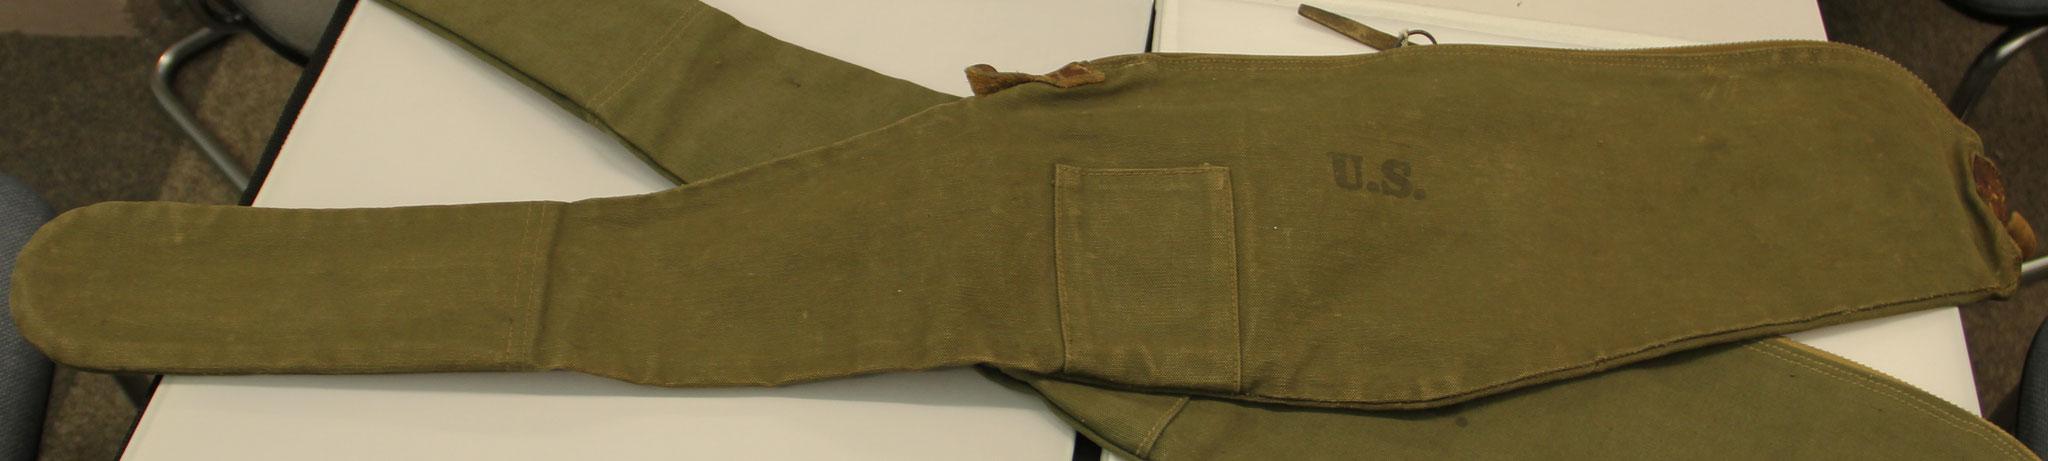 Originele WW II .30M1 karabijn hoezen. Vanaf € 175,-